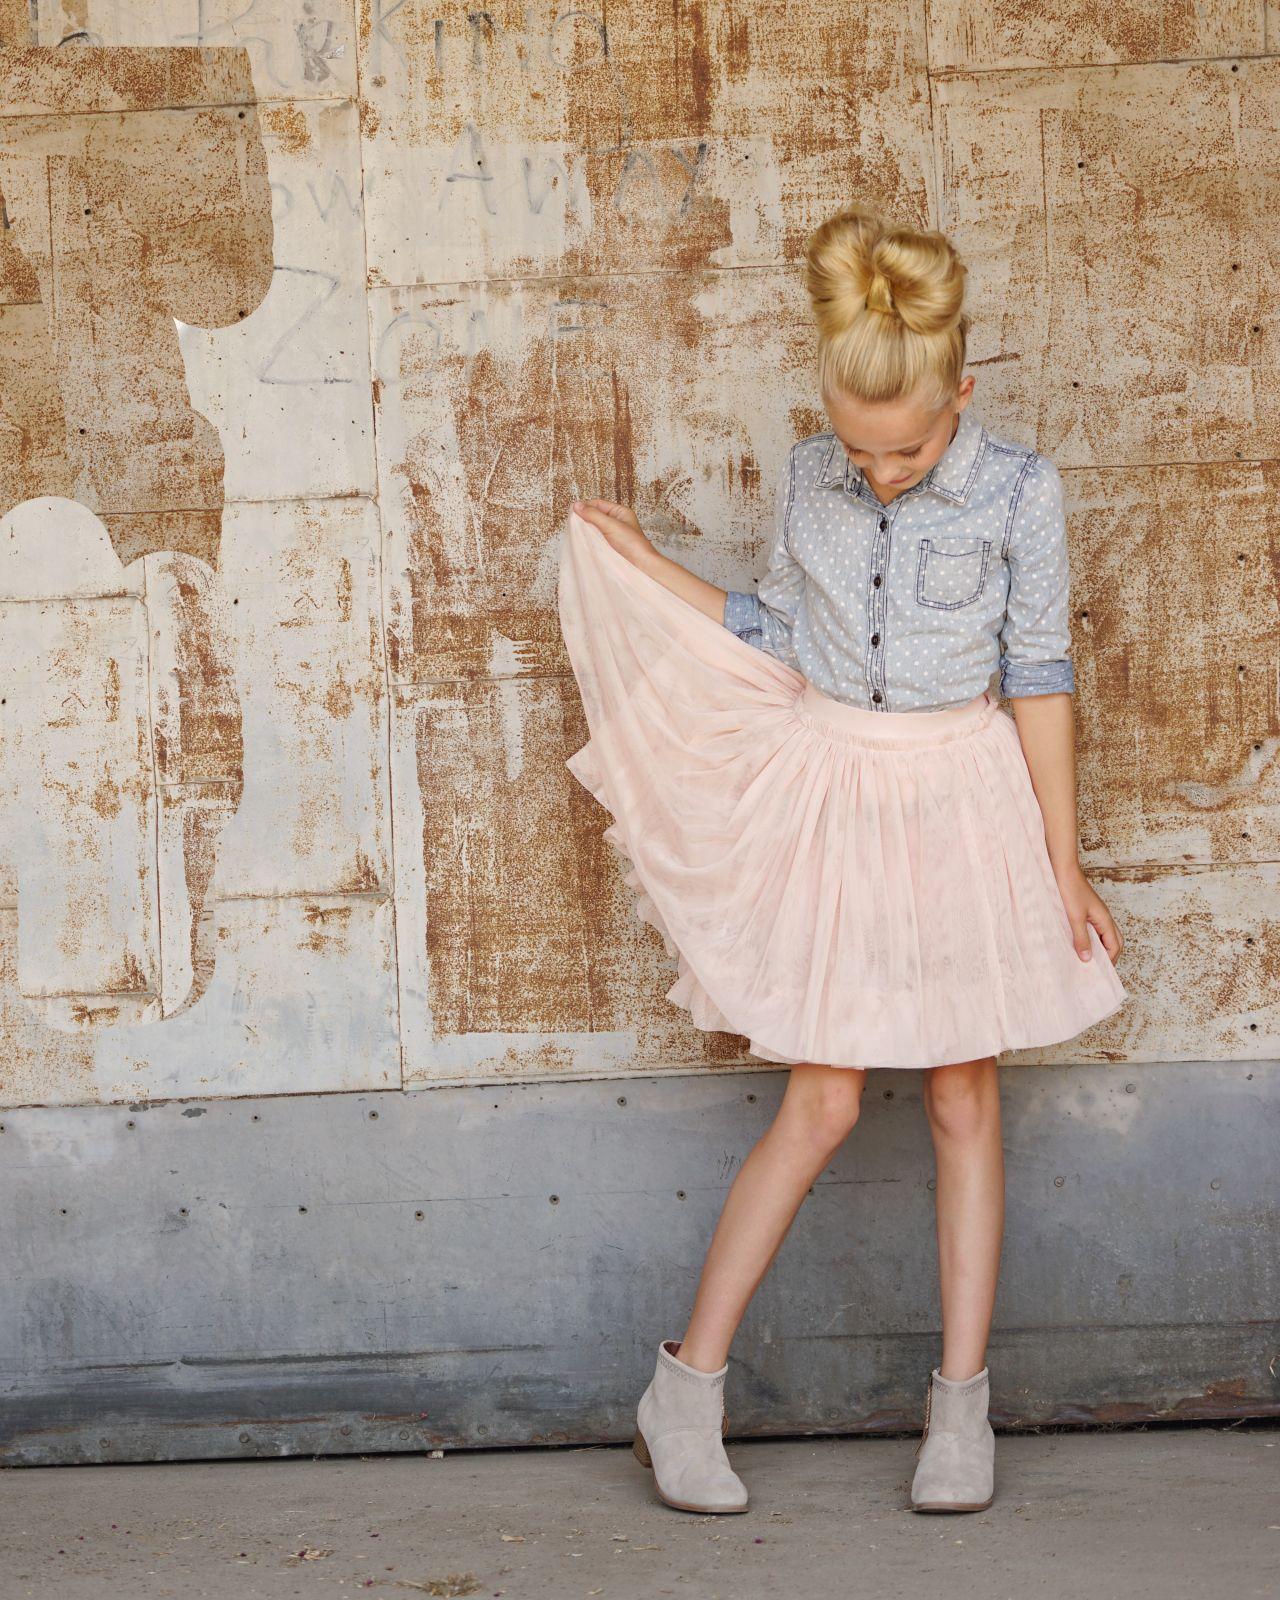 Kids and Tween Fashion Blog, Kids and Tween Fashion Blog tut girls fashion…